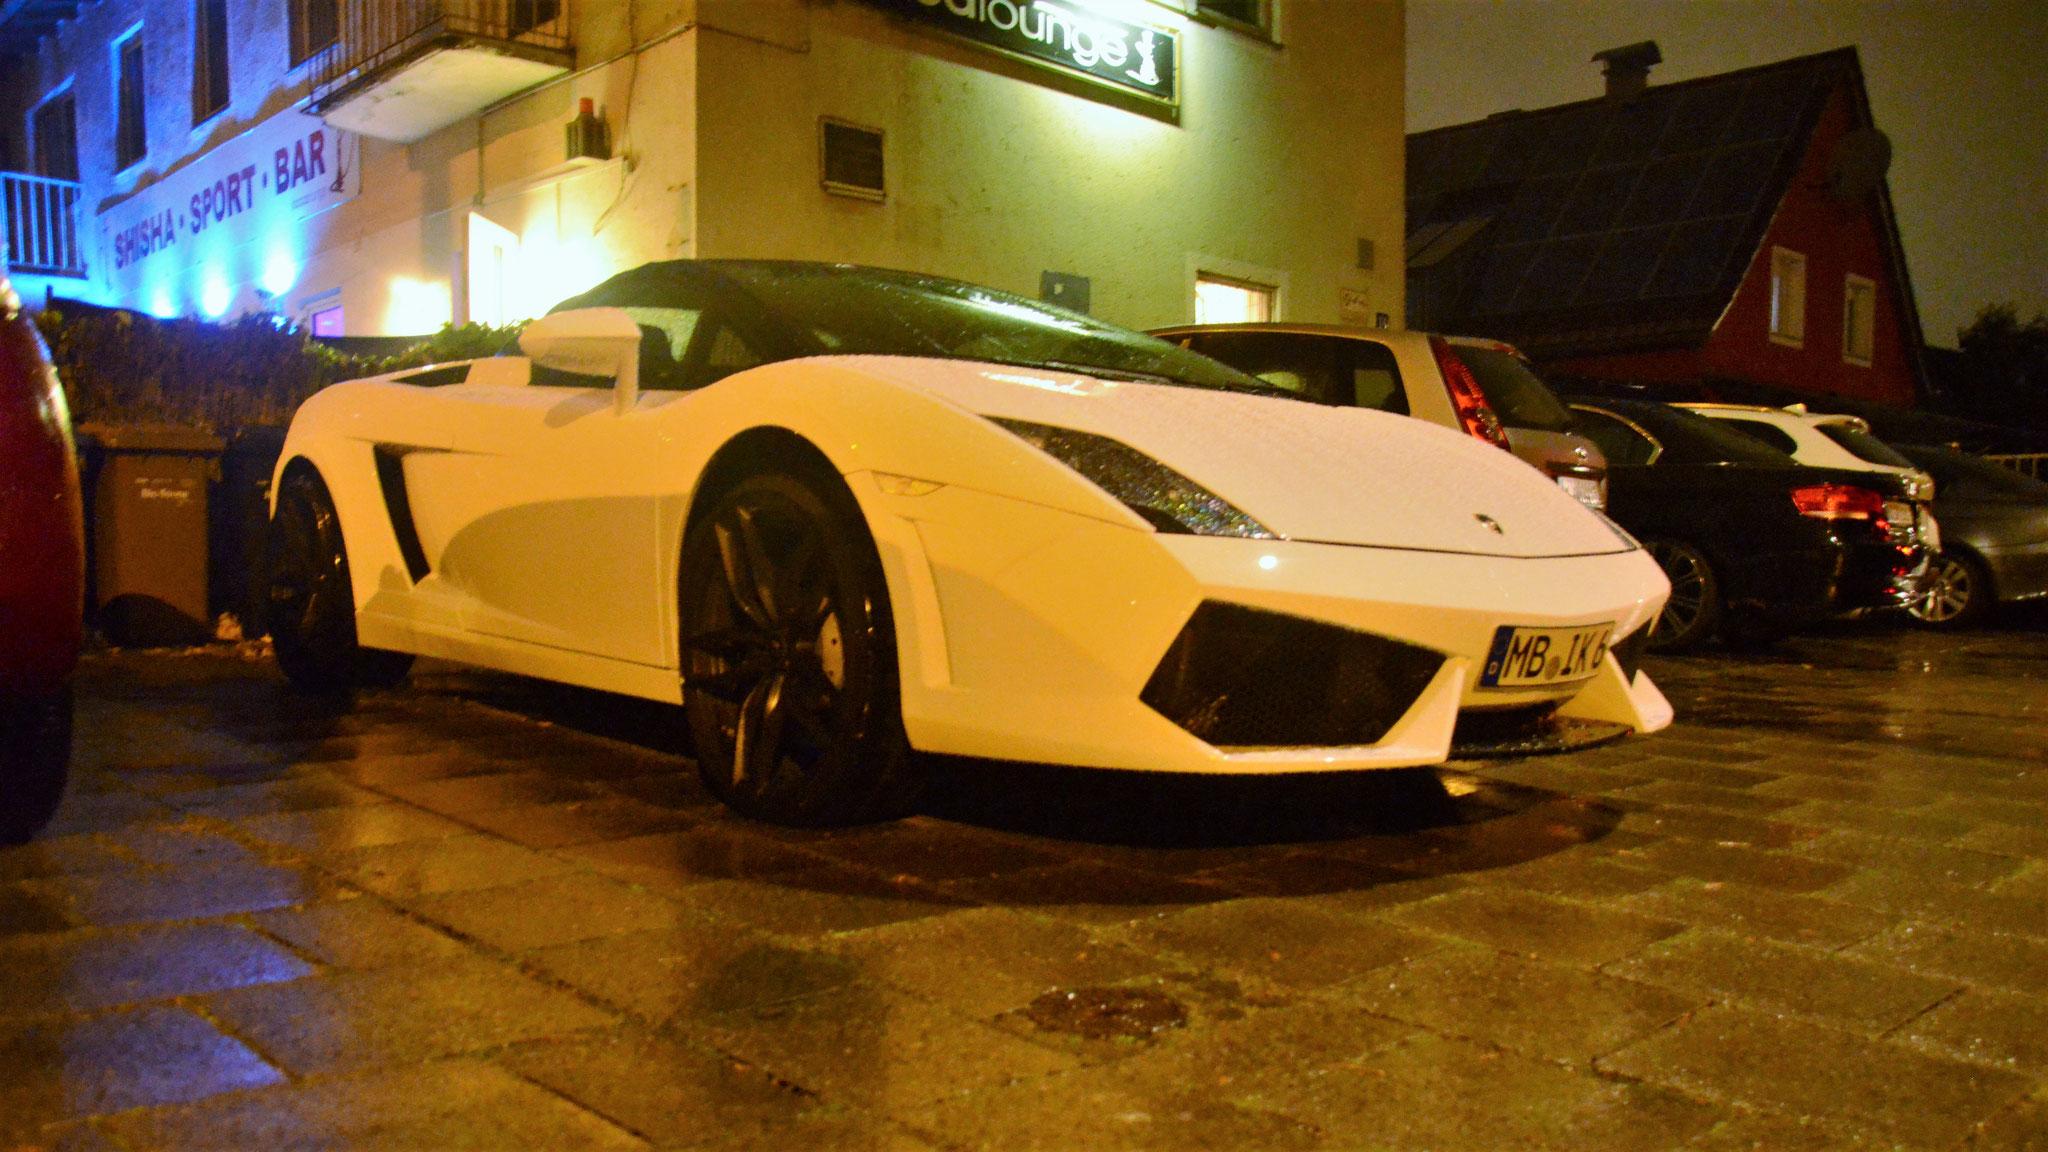 Lamborghini Gallardo LP 550 Spyder - MB-IK-6